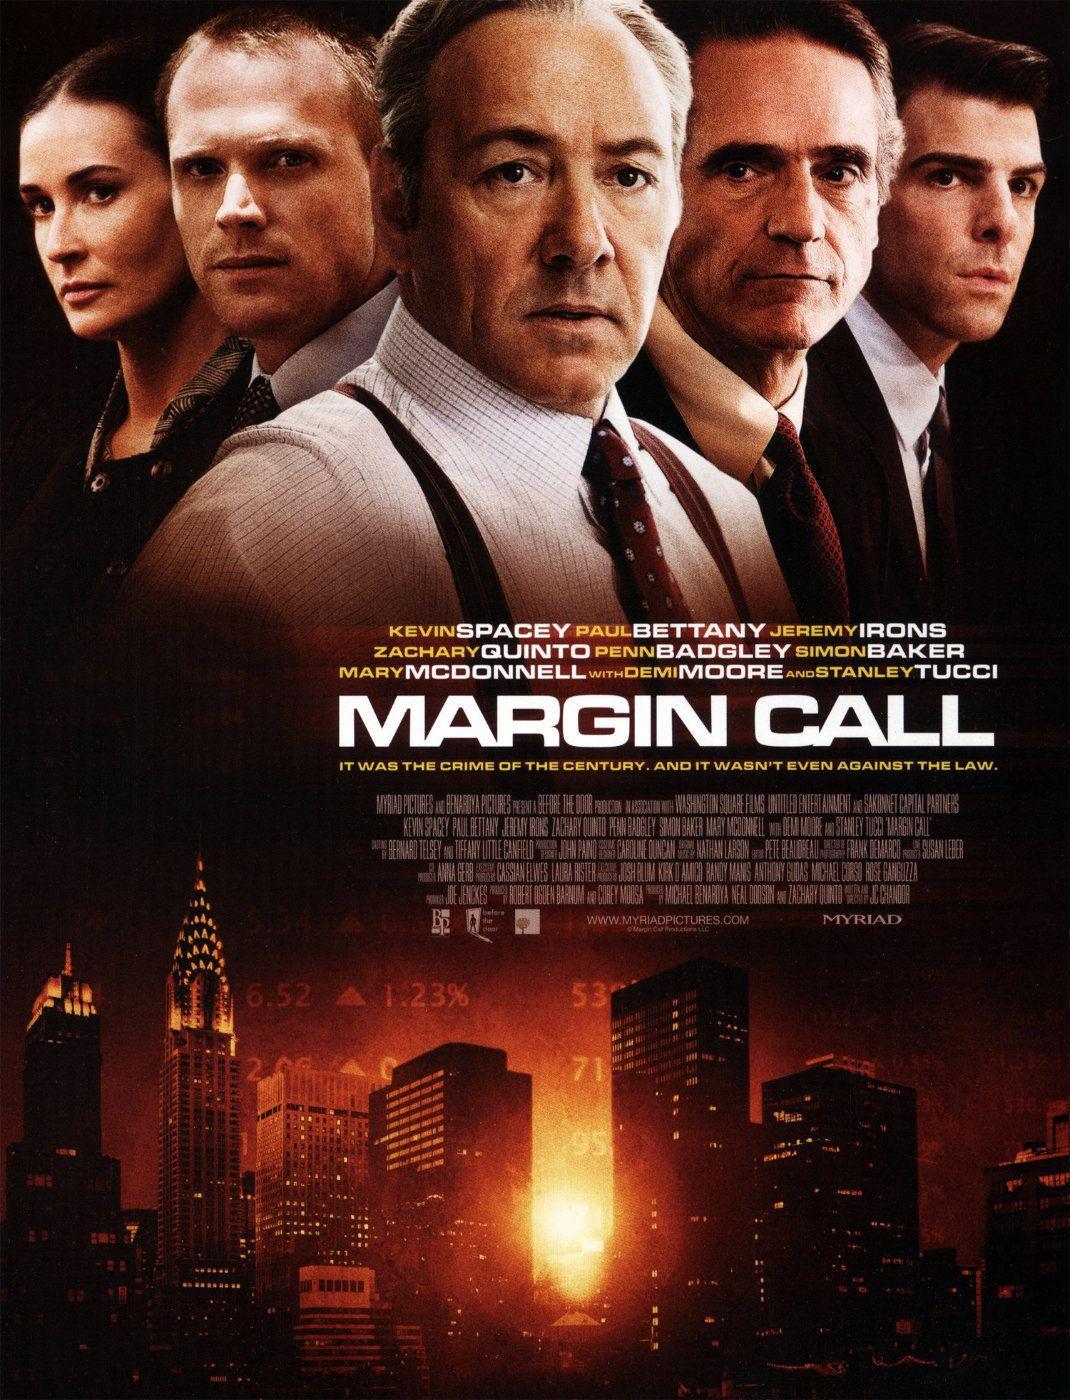 Magin Call